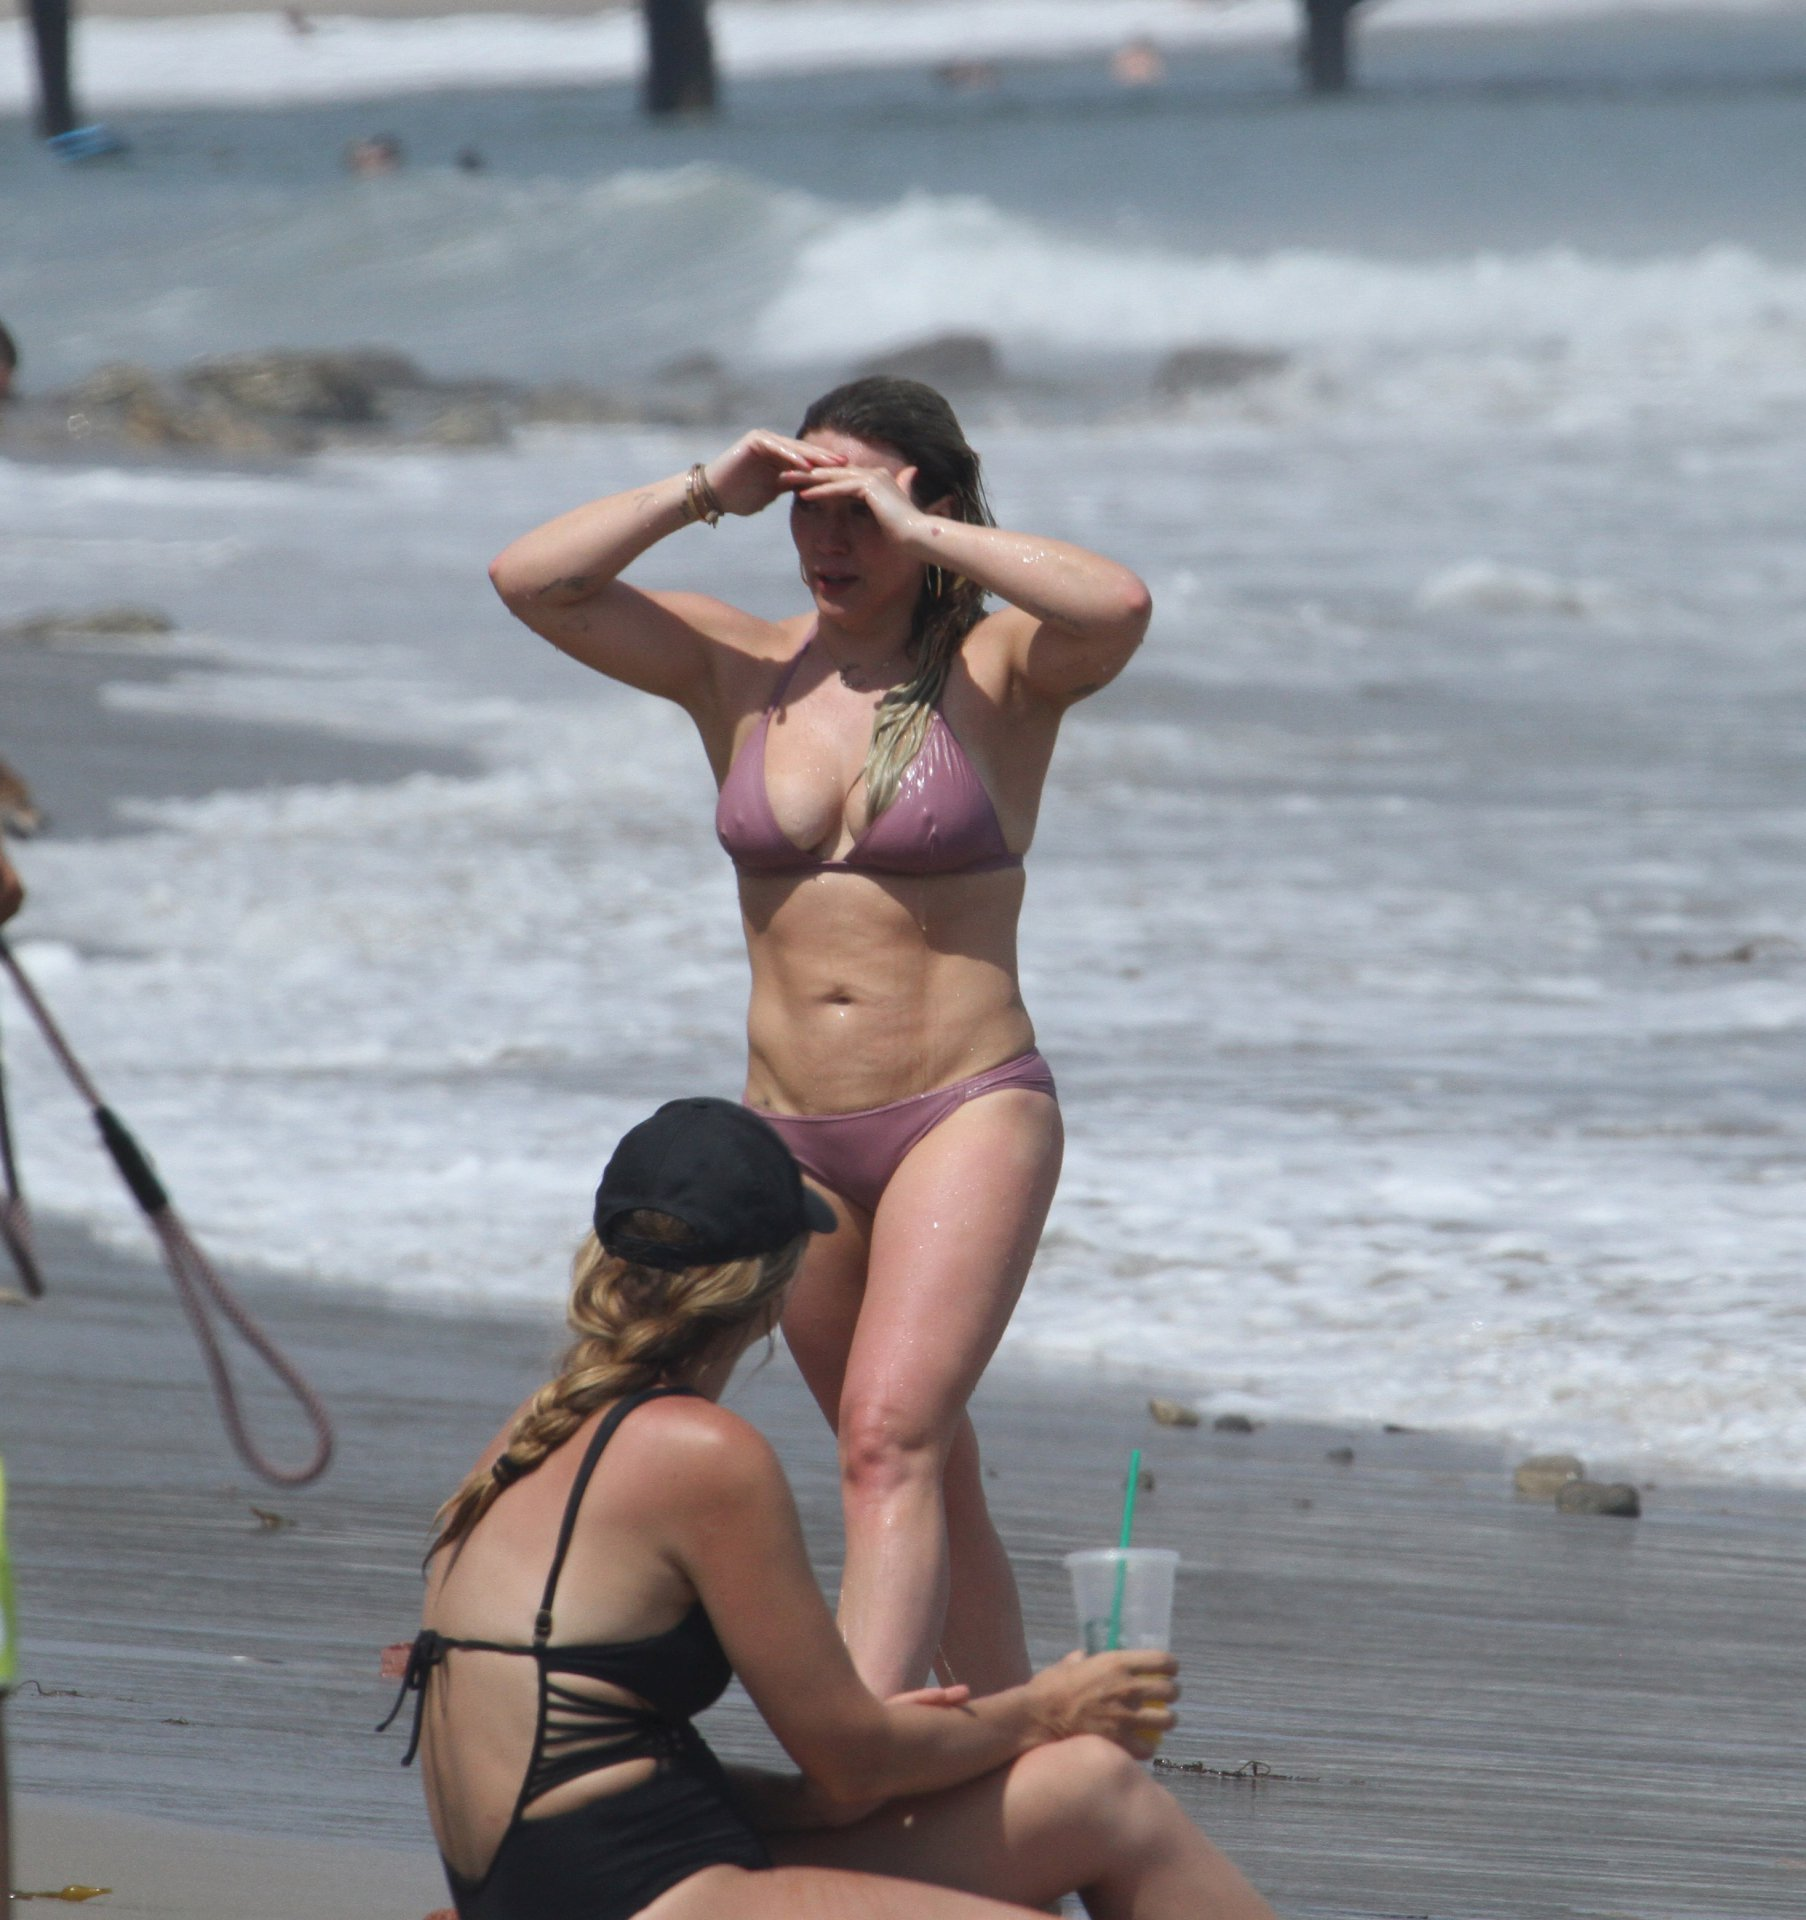 На пляже не стесняются фото